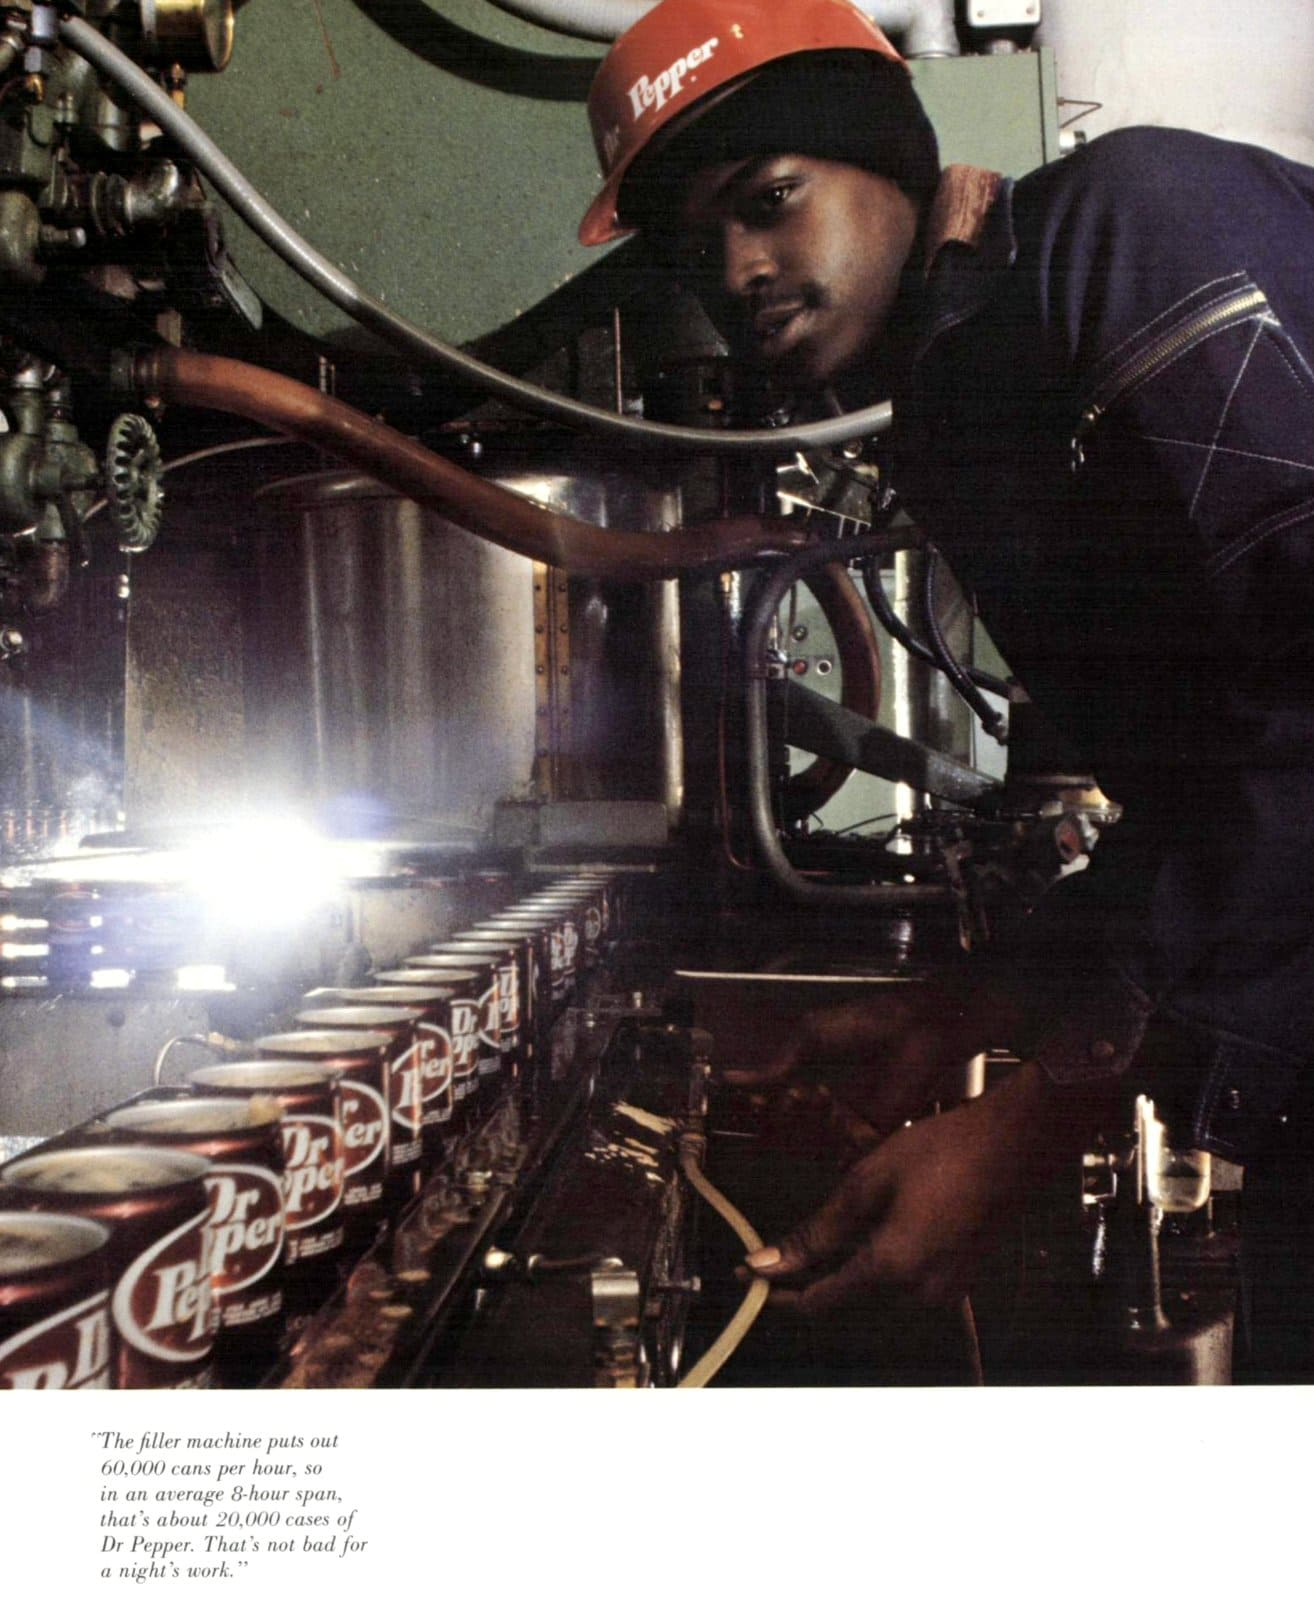 Vintage Dr Pepper cans on production line (1977)